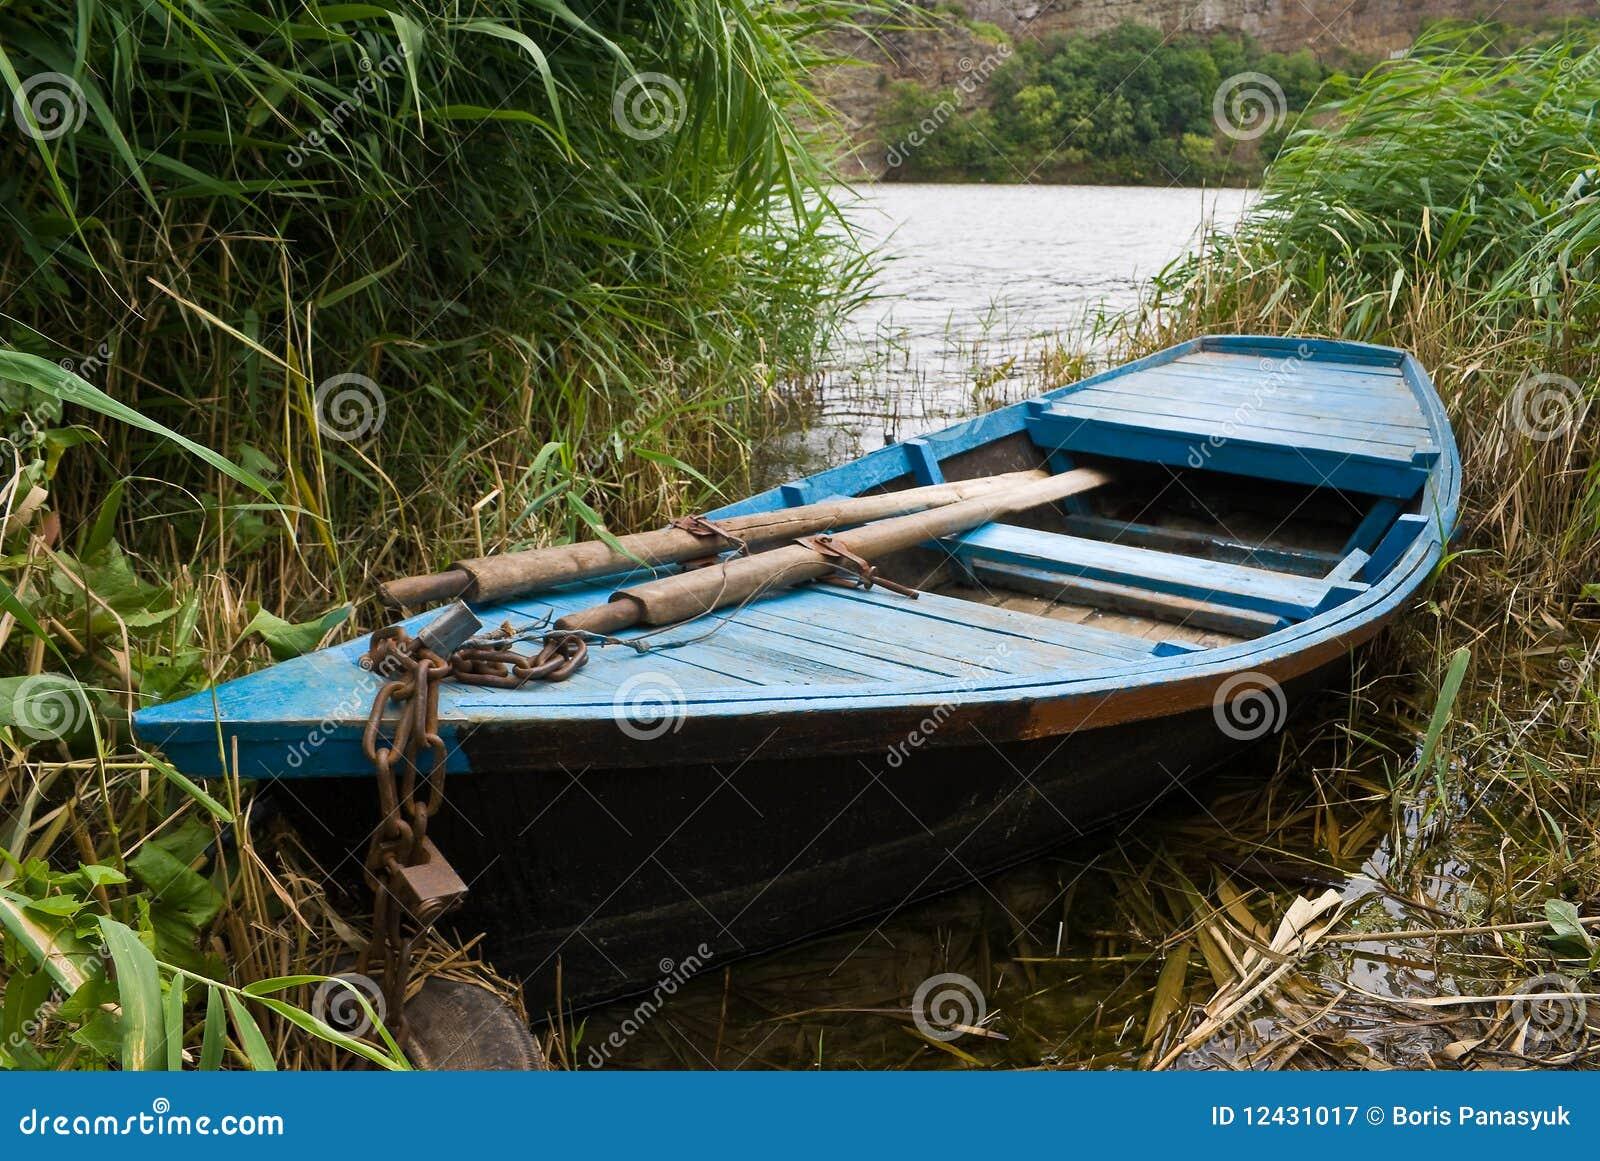 Old Wooden Fishing Boats Old wooden fishing boat